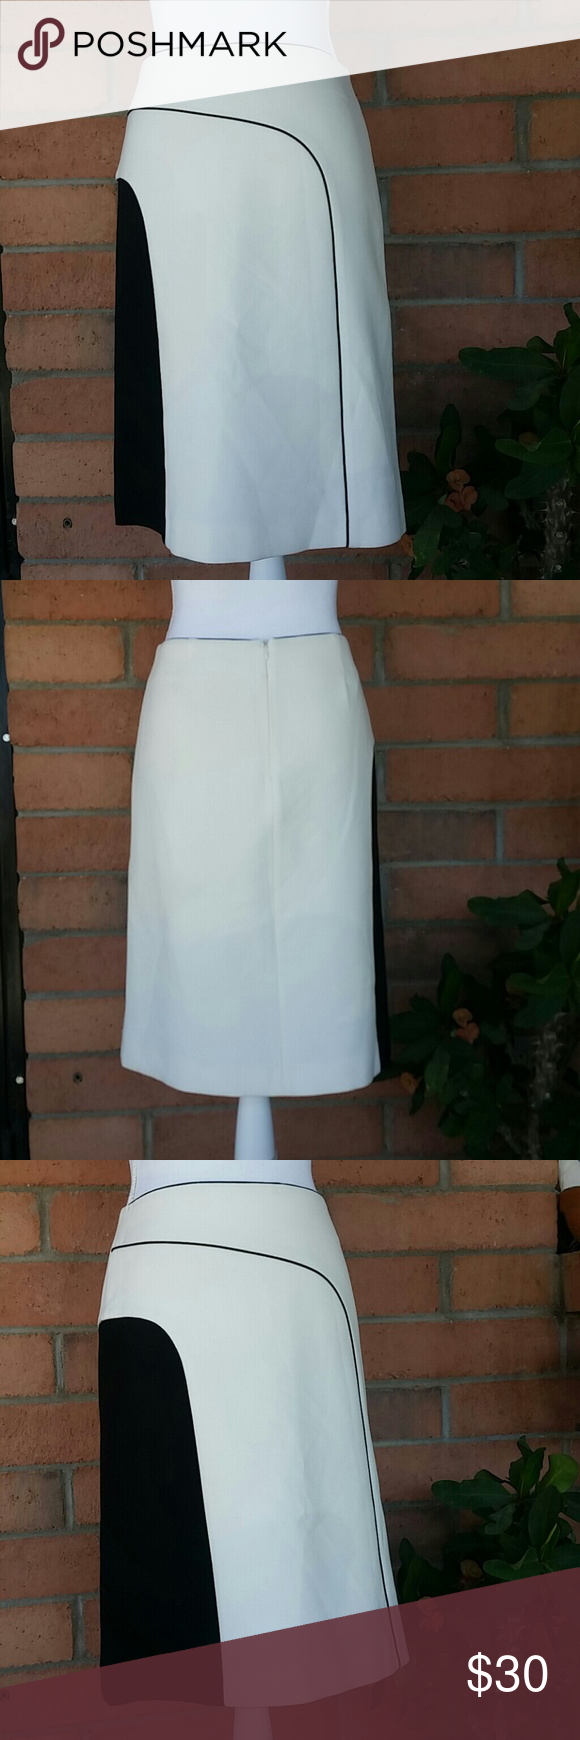 "TRUCCO White/Black Color Block Skirt Euro Sz. 38 Great color block design in White/Black by TRUCCO Euro Sz. 38 ~ US Sz.   Measurements:              Waist: 28""                                         Length: 22 1/2"" TRUCCO Skirts"